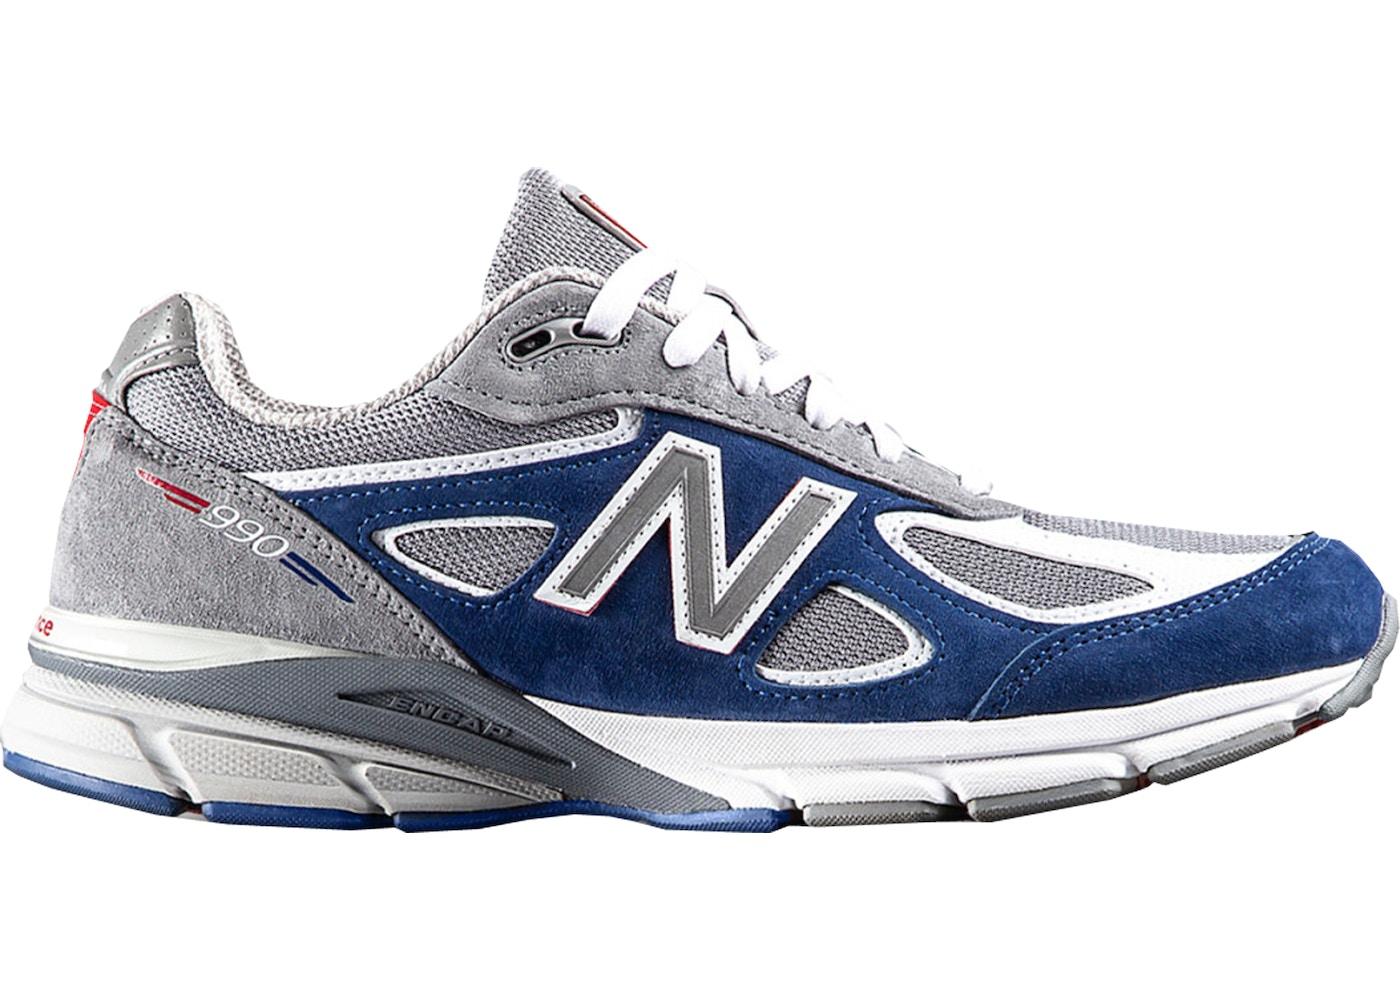 sports shoes a5337 8f373 New Balance 990 DTLR x Villa US - M990GA4